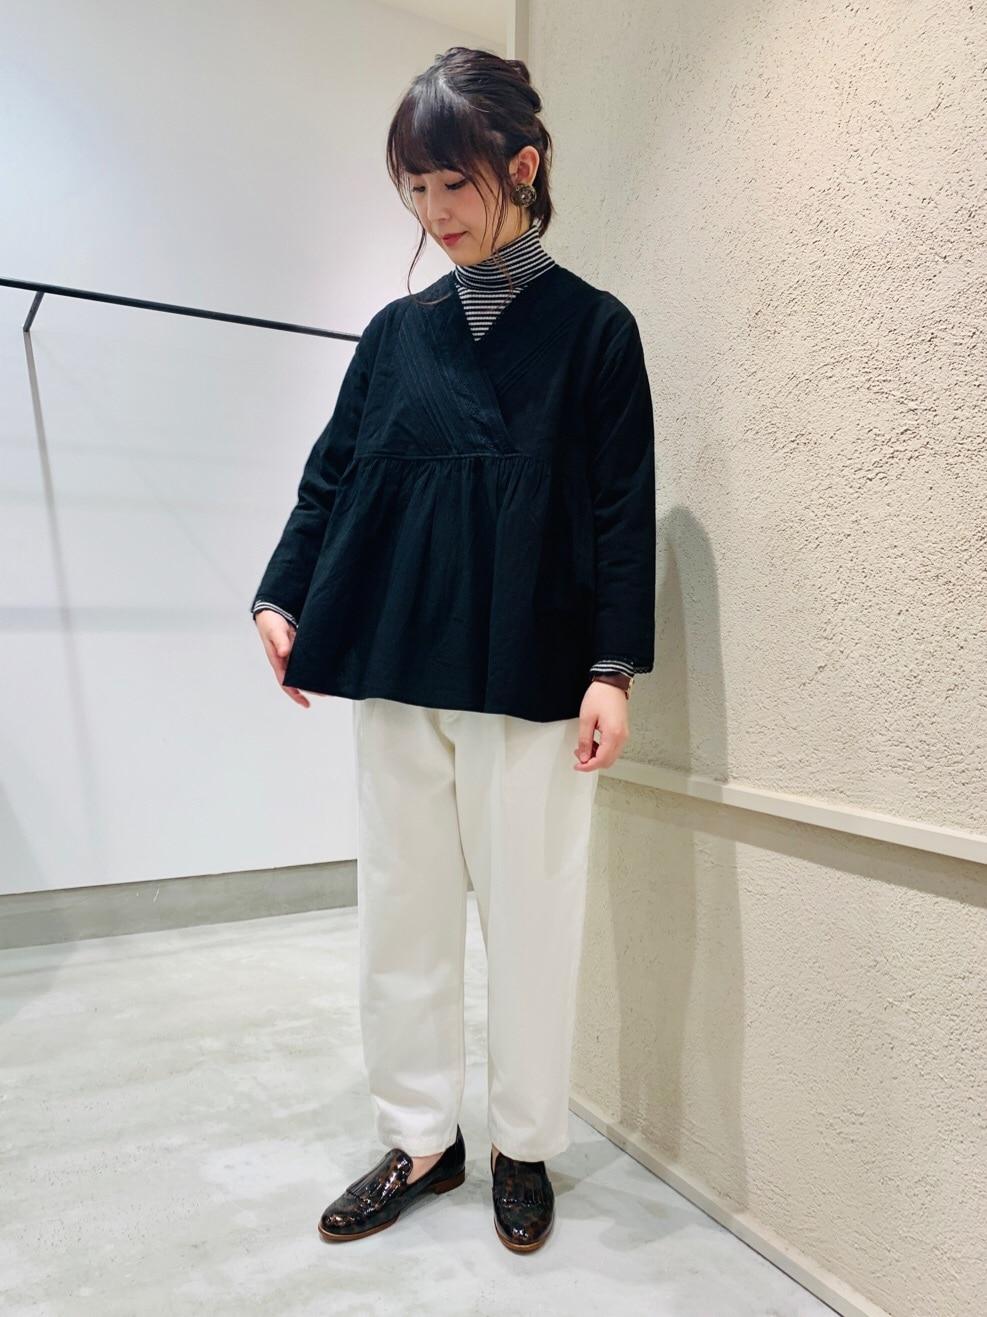 chambre de charme 横浜ジョイナス 身長:162cm 2020.10.31